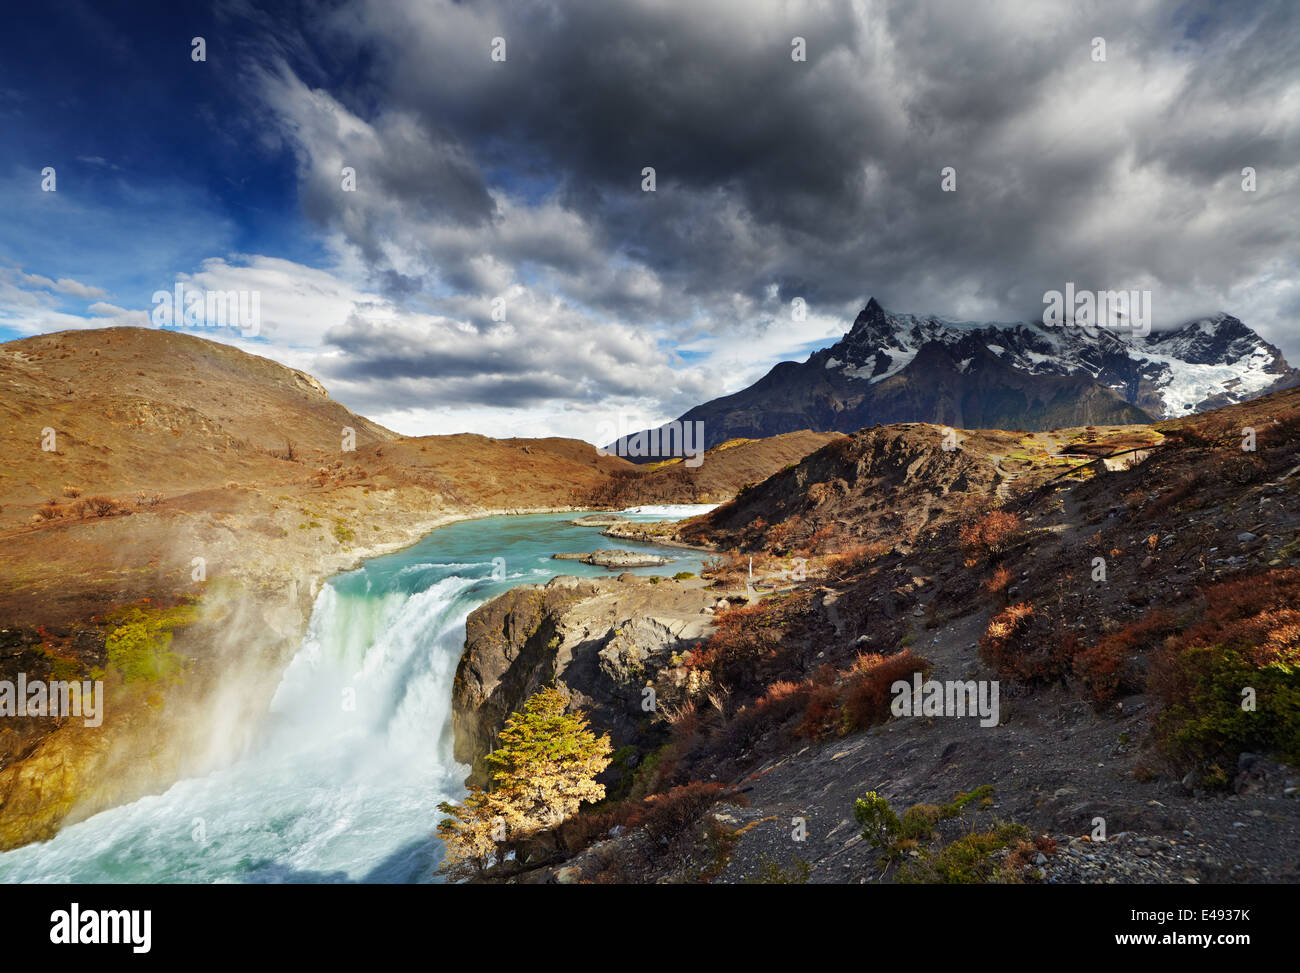 Wasserfall im Nationalpark Torres del Paine, Patagonien, Chile Stockbild